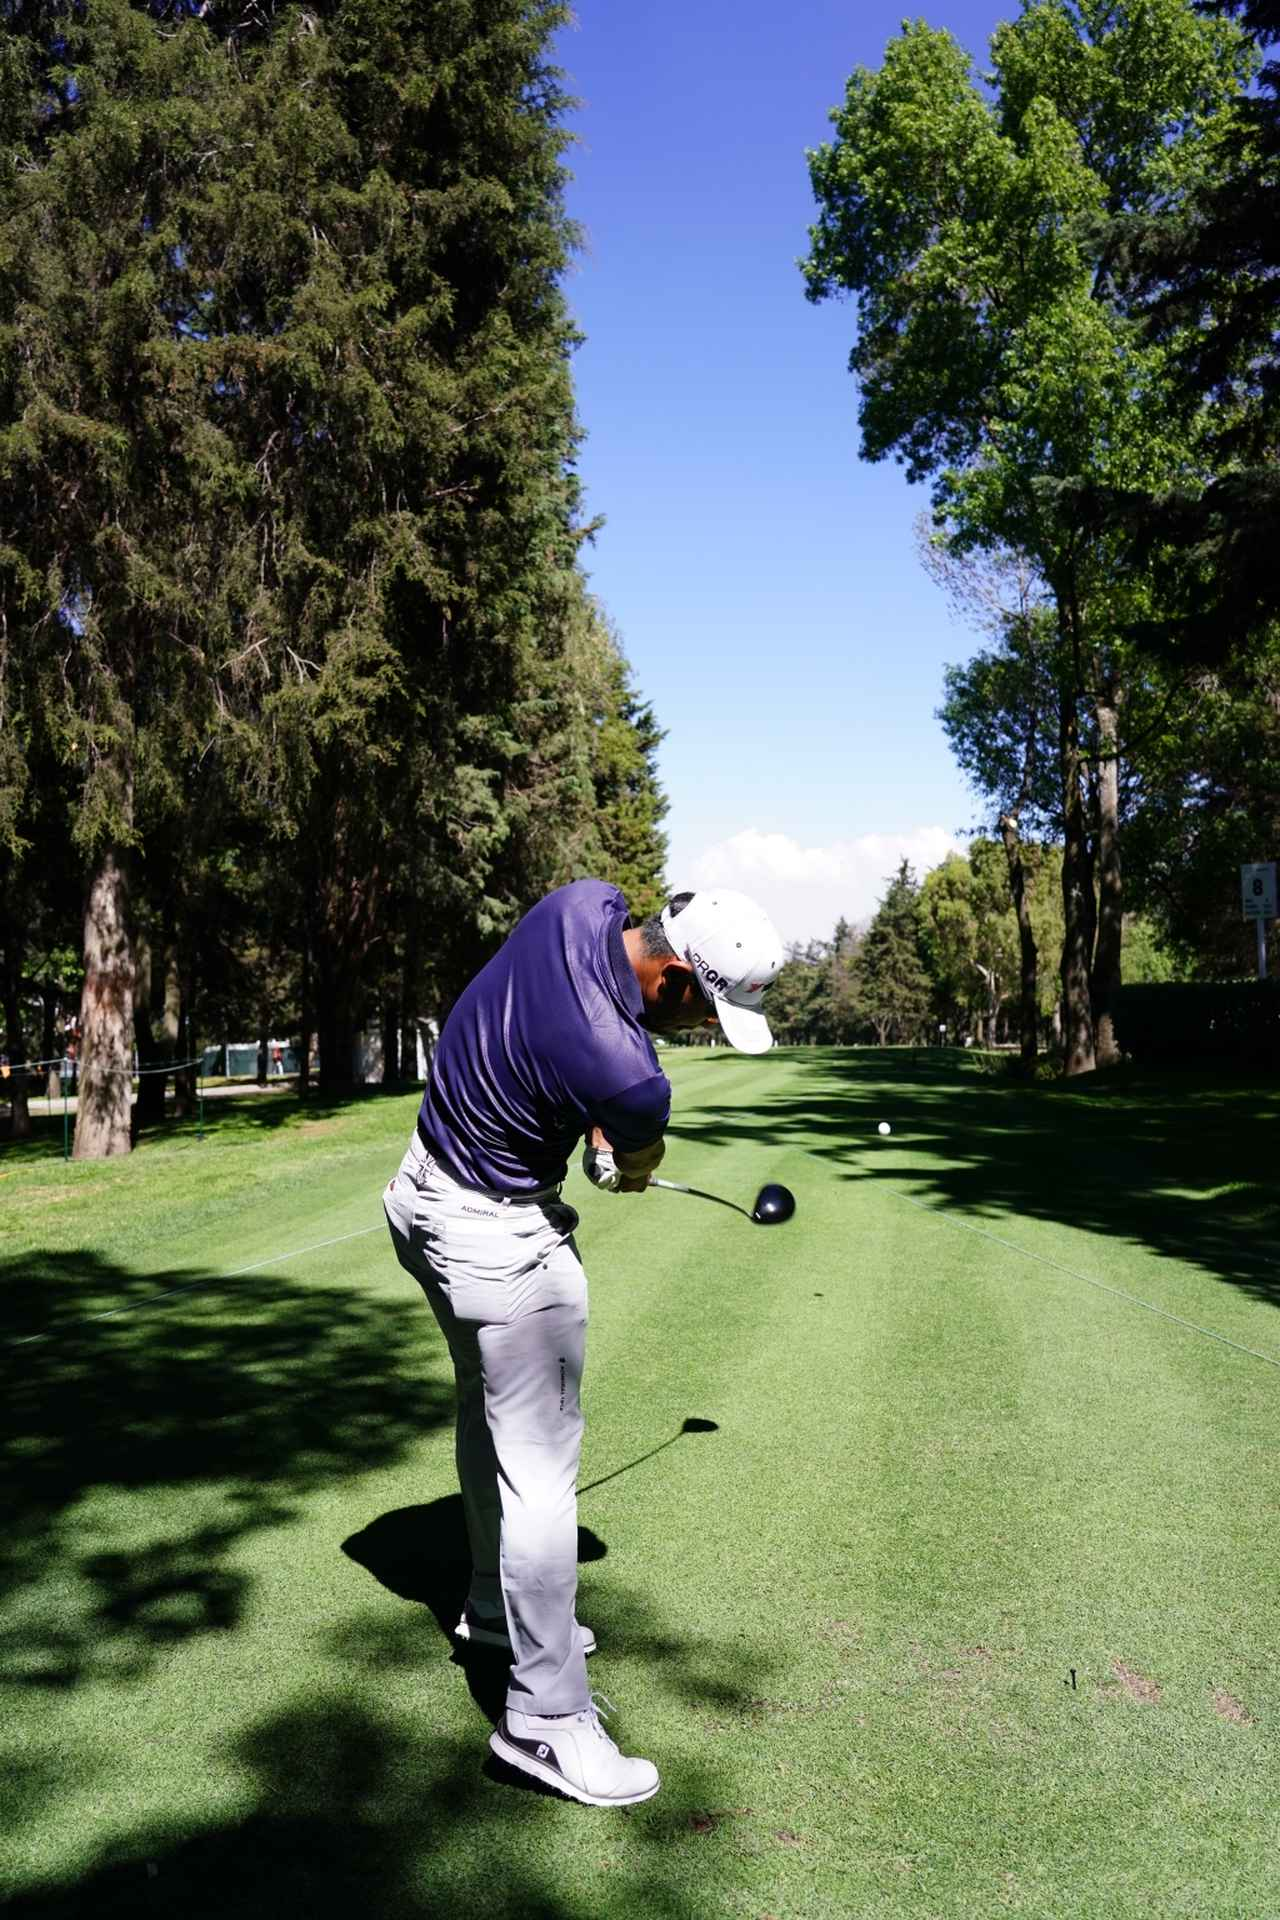 Images : 10番目の画像 - 小平智のドライバー連続写真 - みんなのゴルフダイジェスト